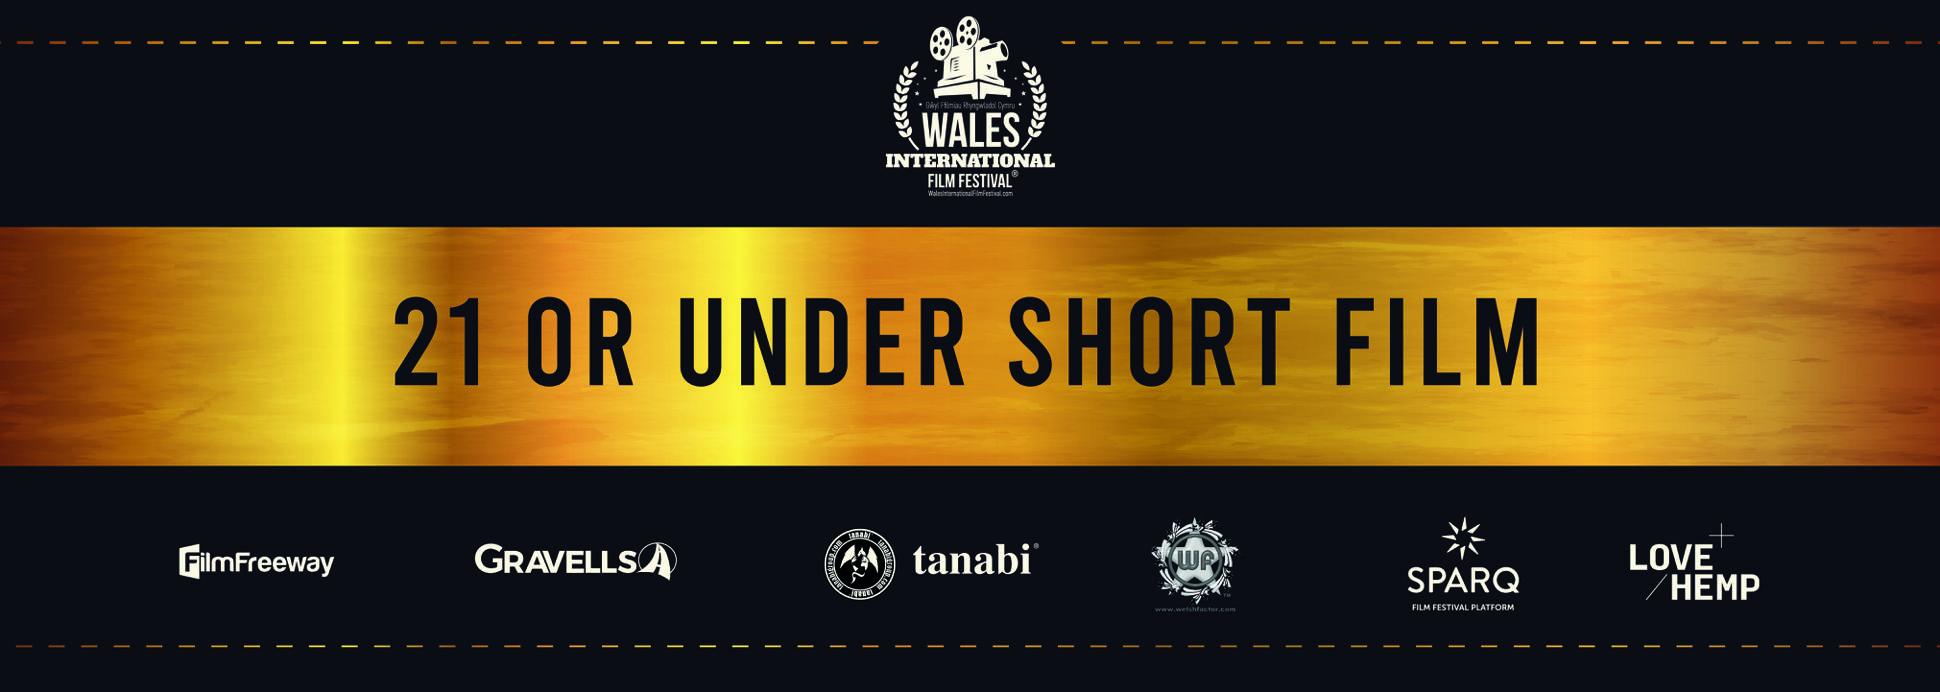 21 or Under Short Film